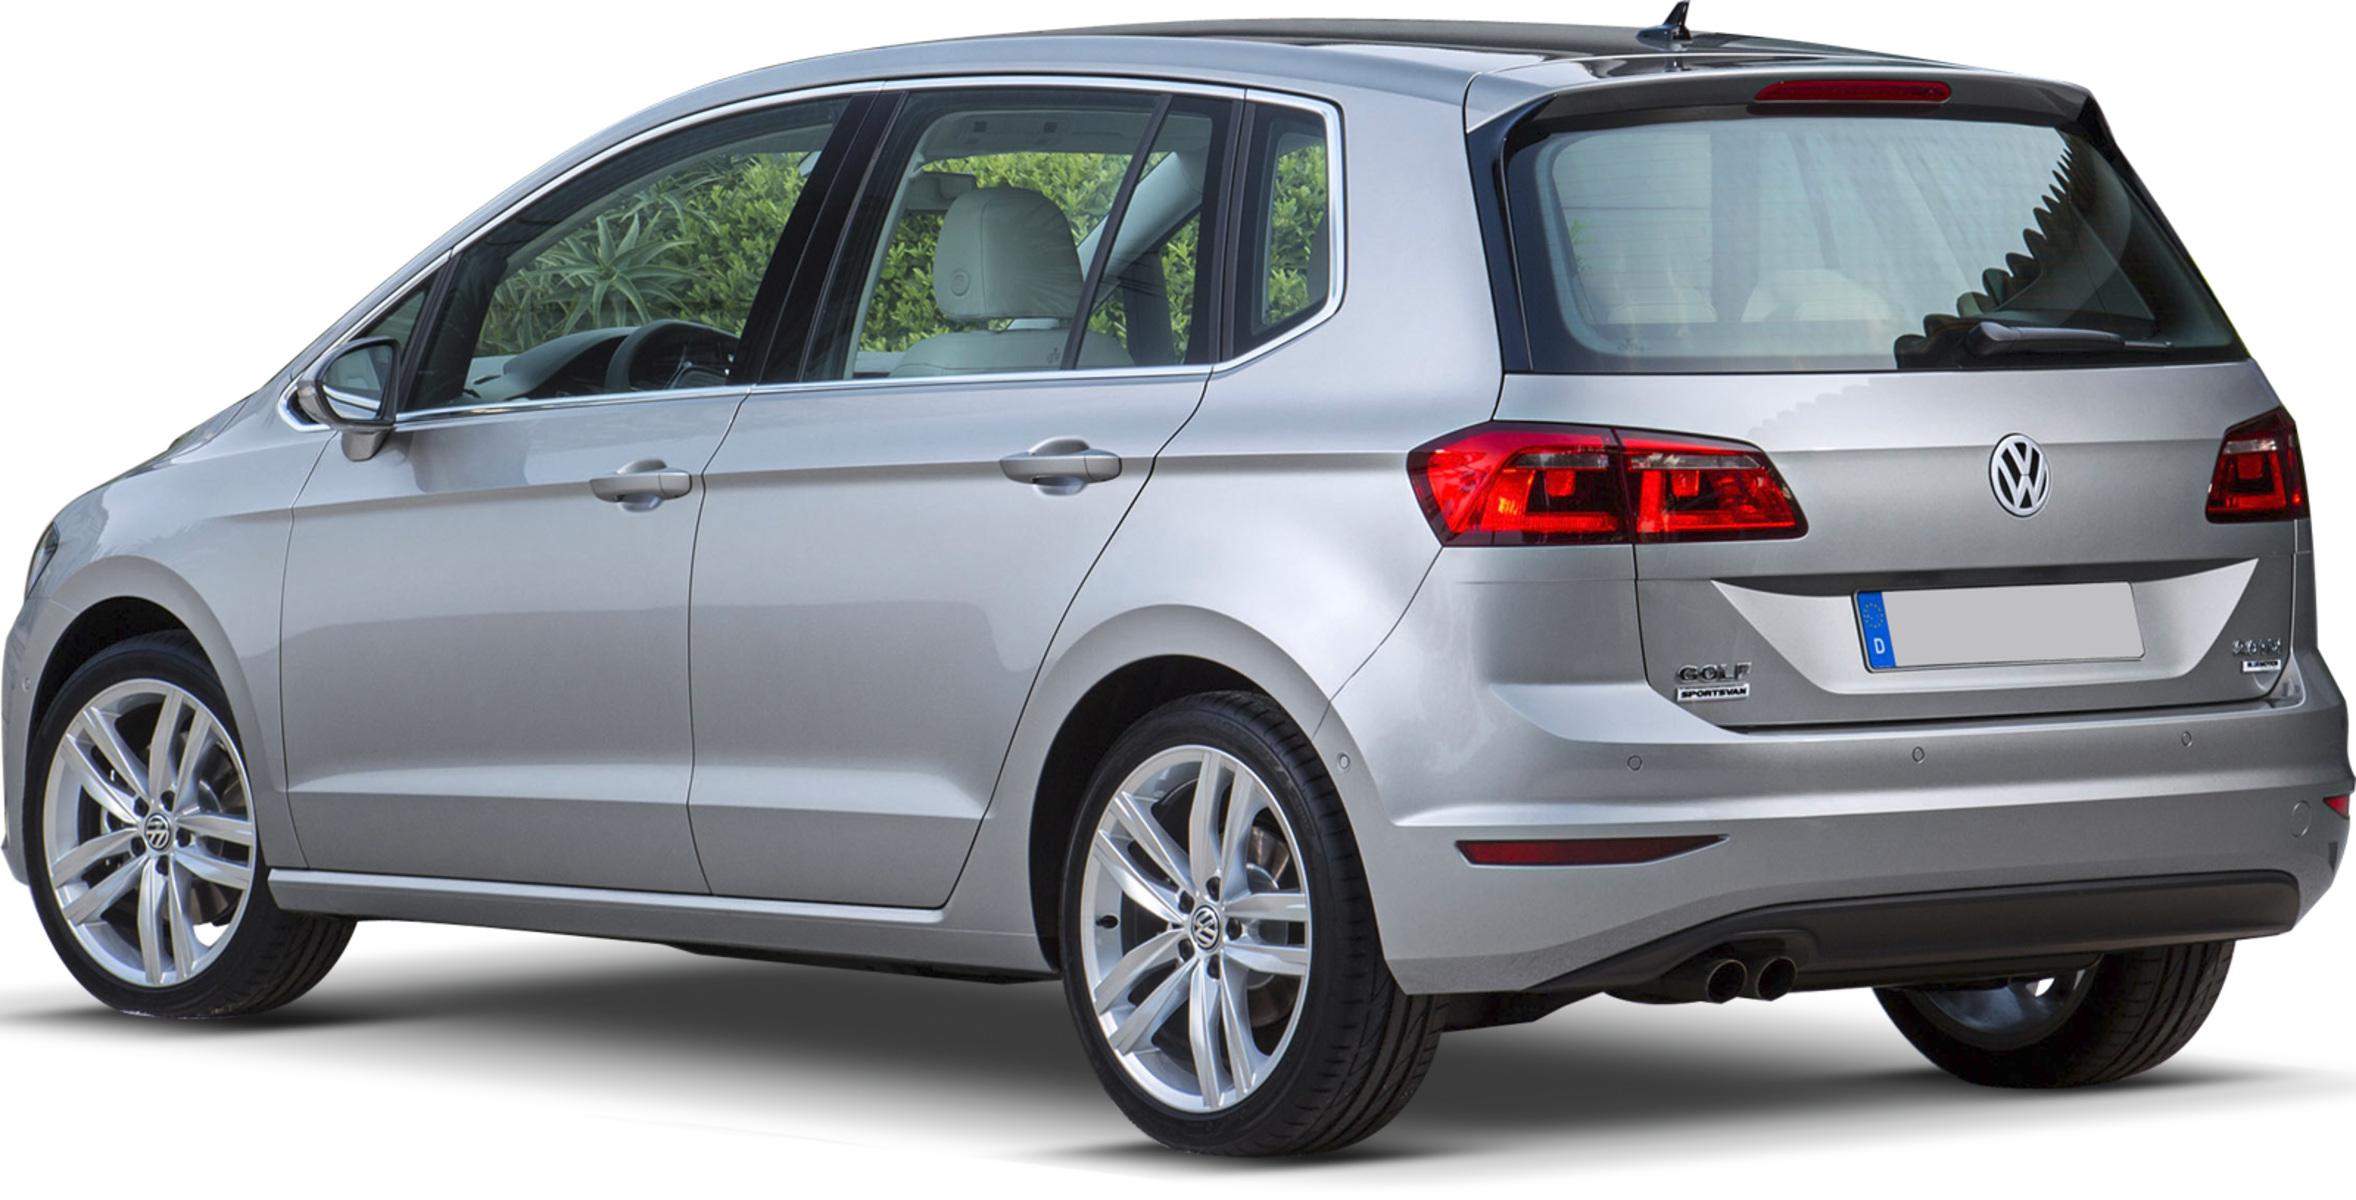 listino volkswagen golf sportsvan prezzo scheda tecnica autos post. Black Bedroom Furniture Sets. Home Design Ideas